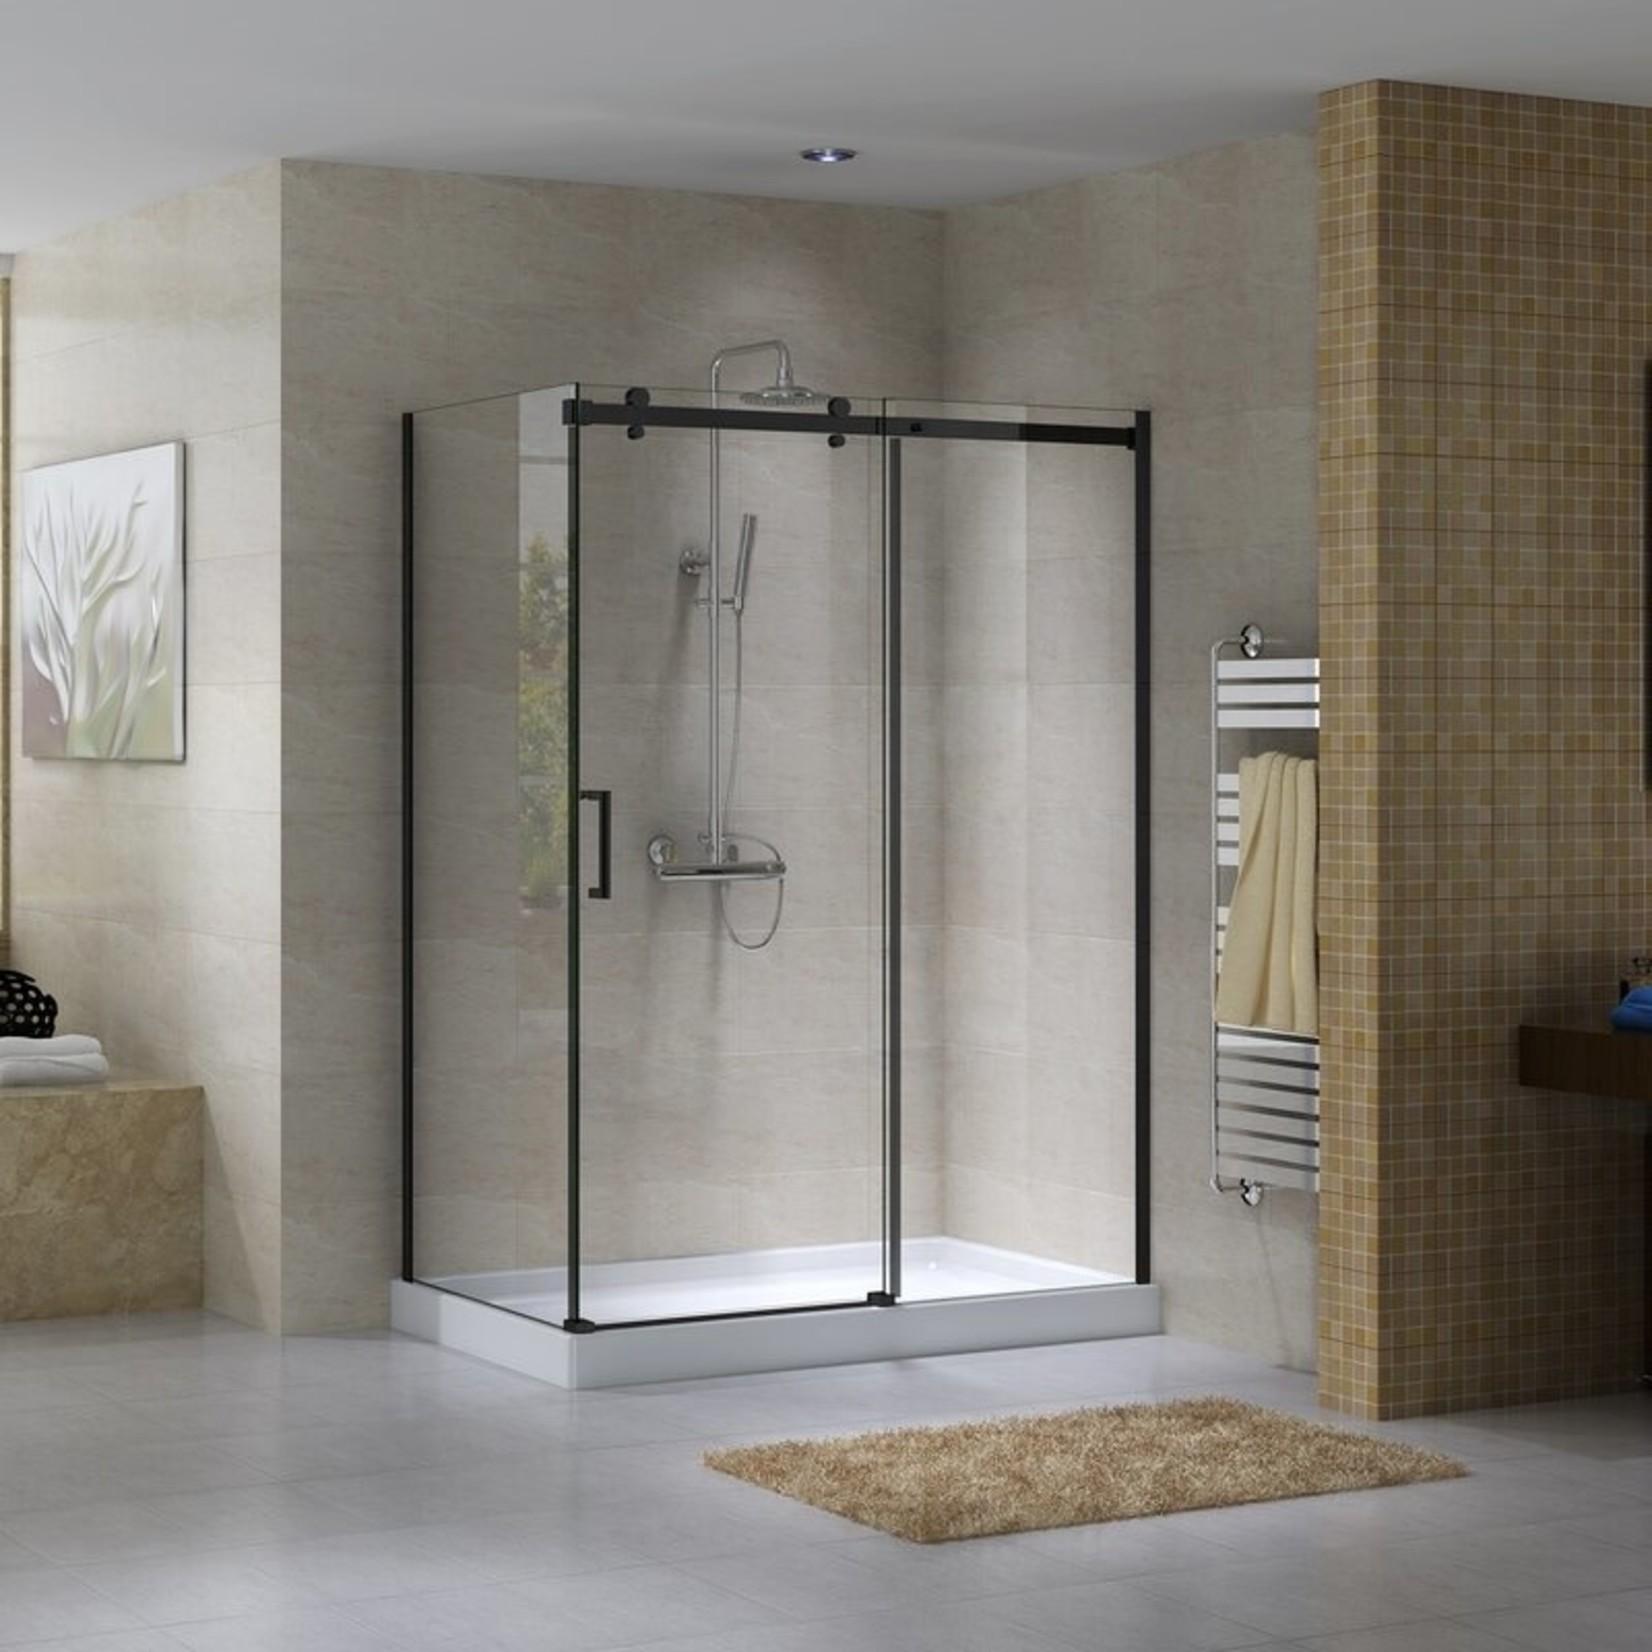 Reversible shower set 36x60 black Quartz Jade series